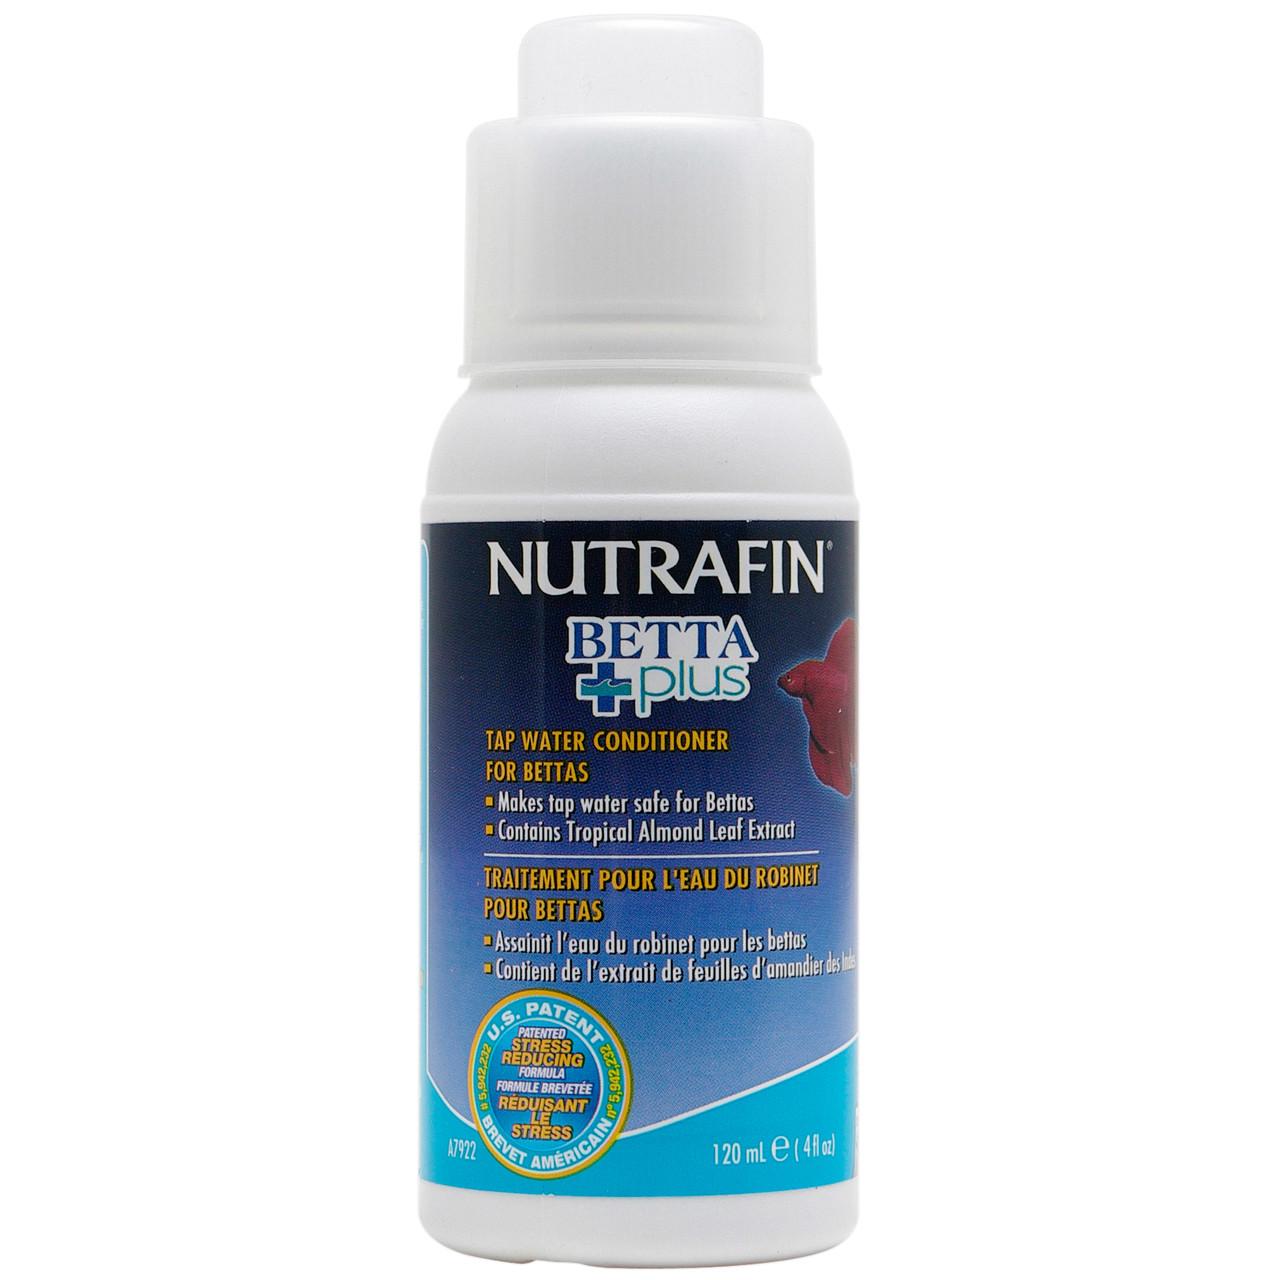 Nutrafin Betta Plus - Tap Water Conditioner for Bettas